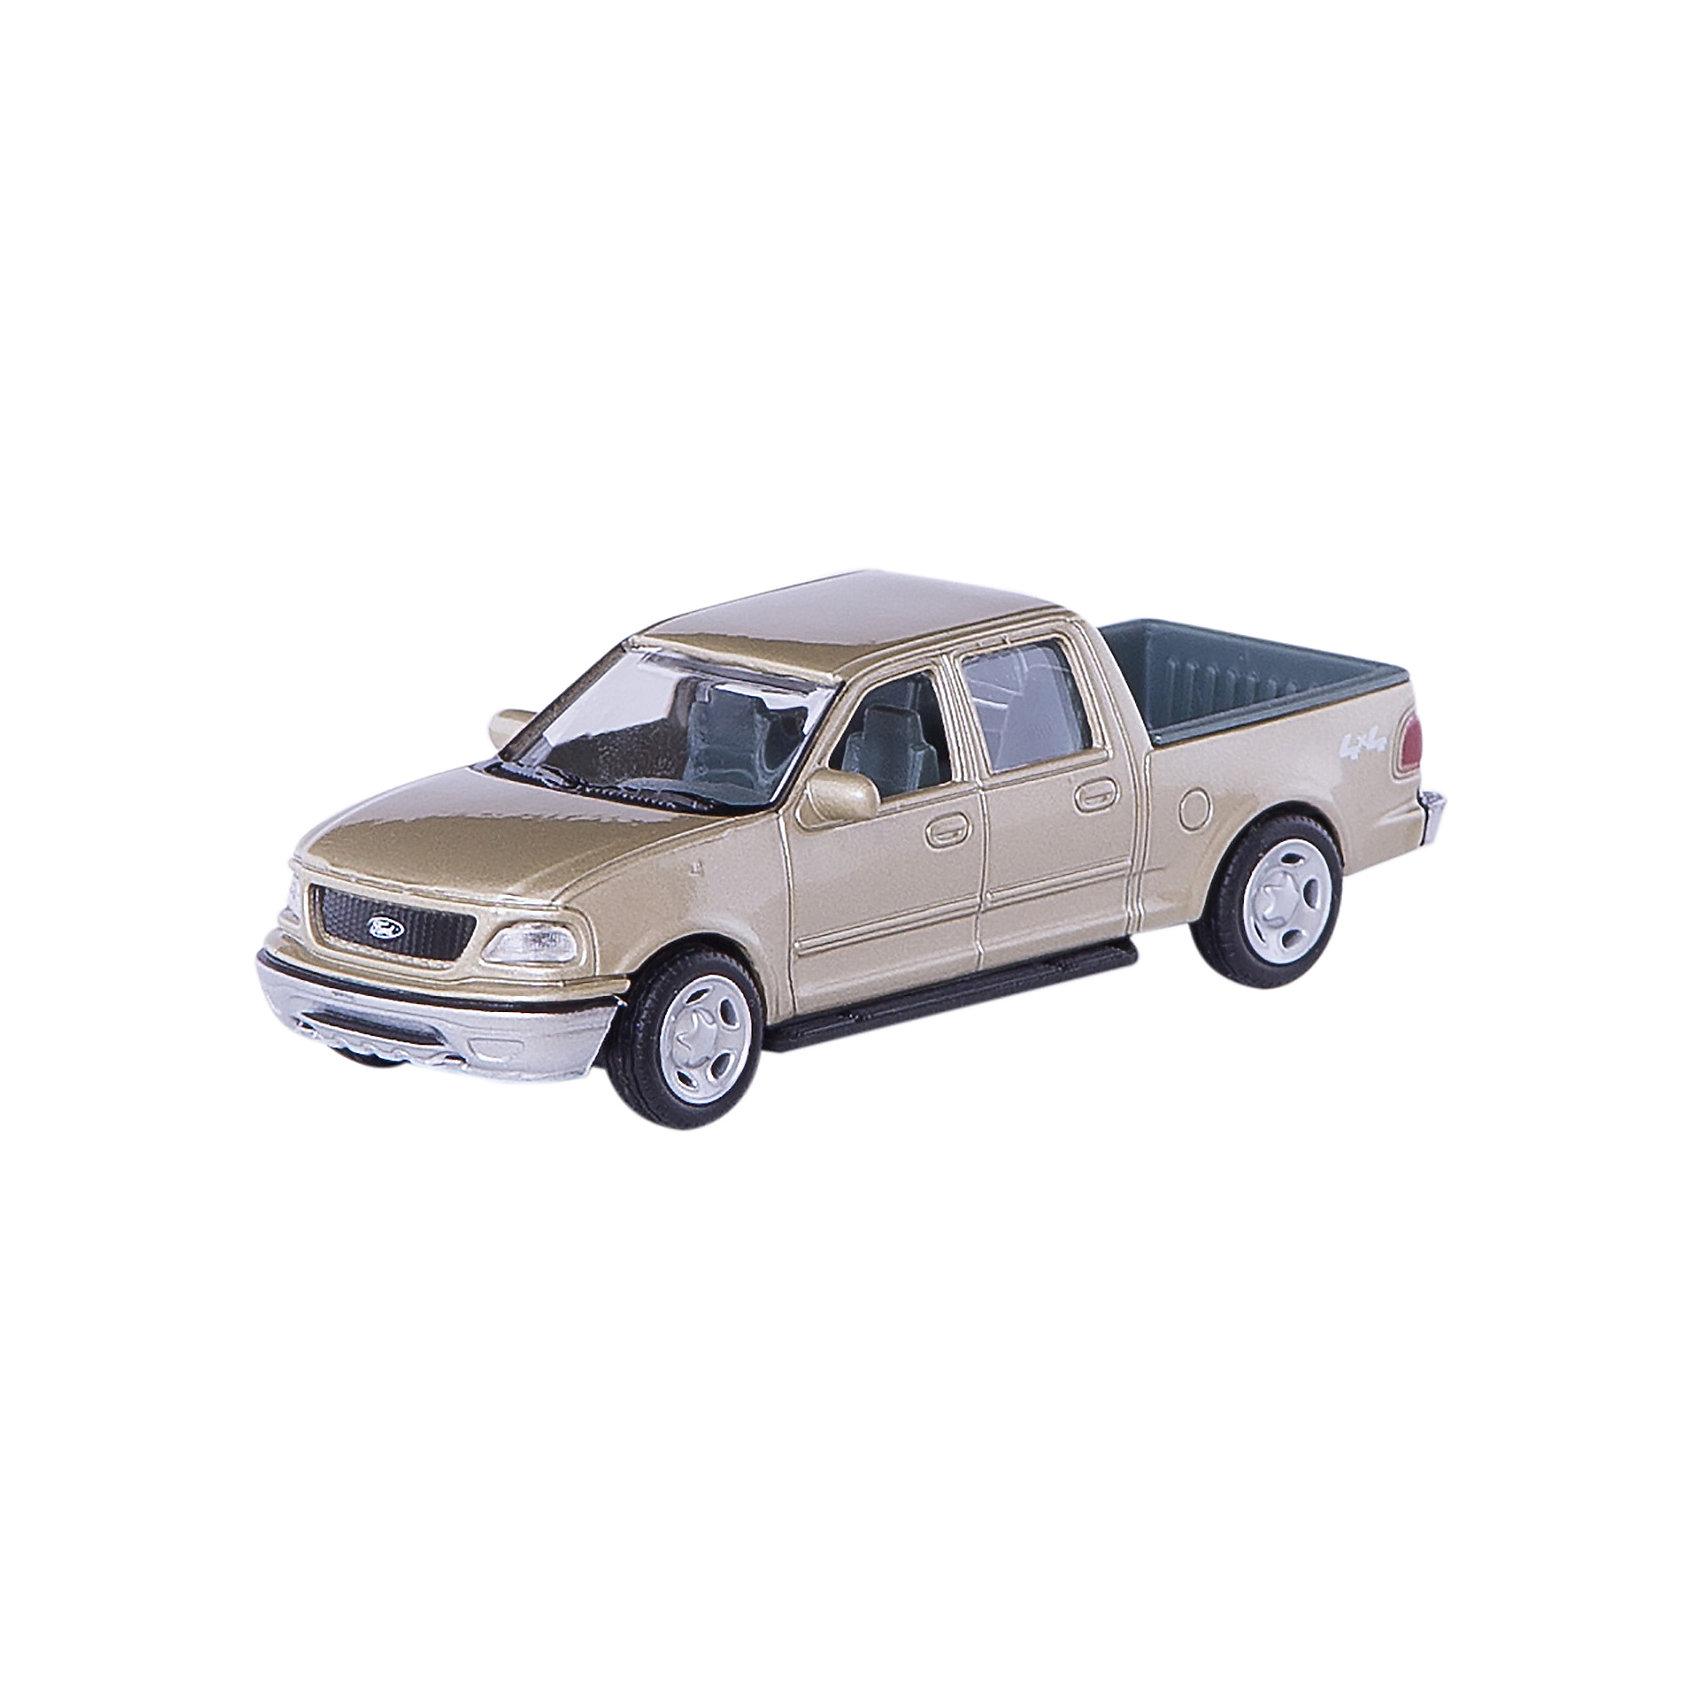 Машинка Ford F-150 Supercrew 1:43, AutotimeМашинки<br><br><br>Ширина мм: 165<br>Глубина мм: 57<br>Высота мм: 75<br>Вес г: 13<br>Возраст от месяцев: 36<br>Возраст до месяцев: 2147483647<br>Пол: Мужской<br>Возраст: Детский<br>SKU: 5584098